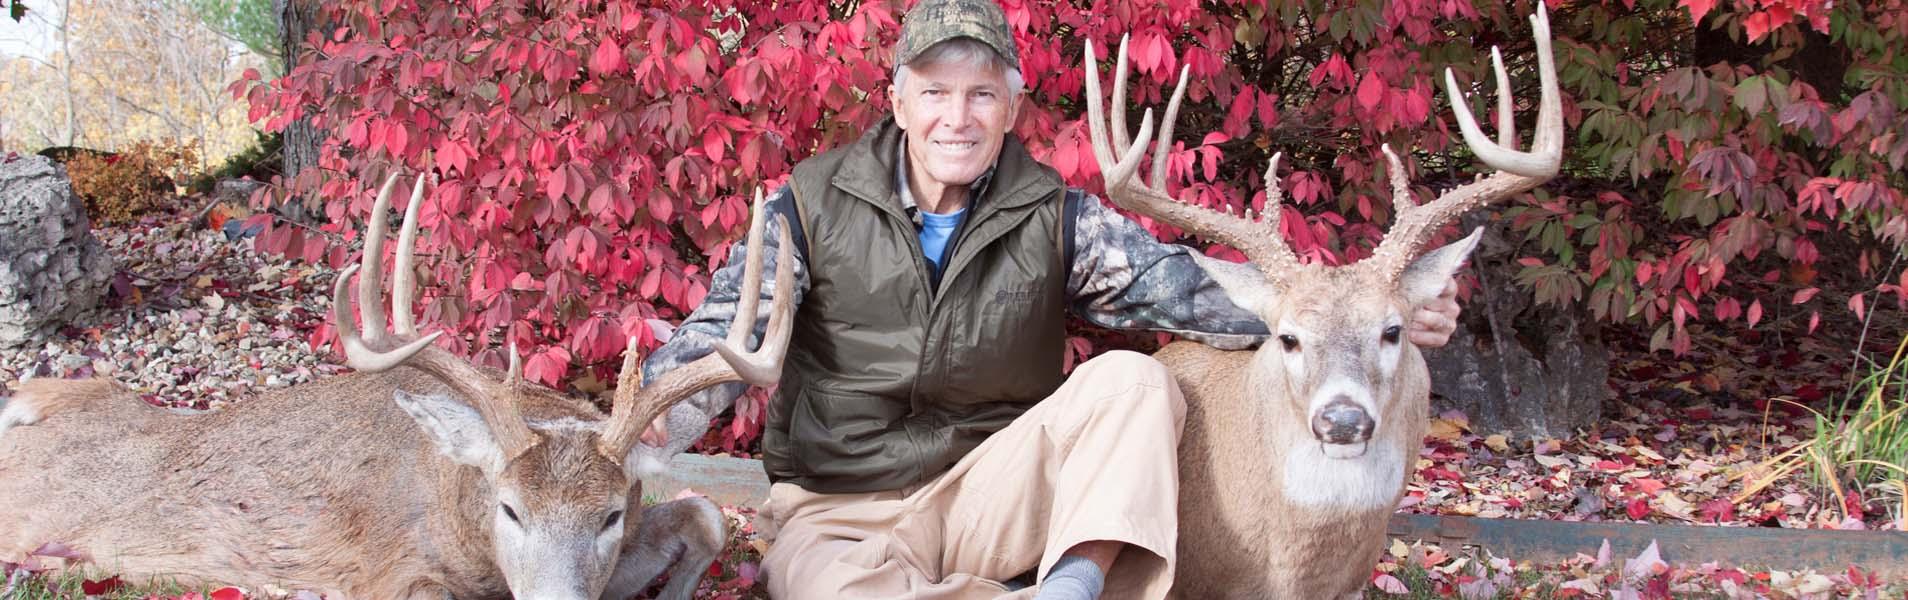 Hunting The Illinois Whitetail Rut | Heartland Lodge regarding 2021 Il Deer Rut